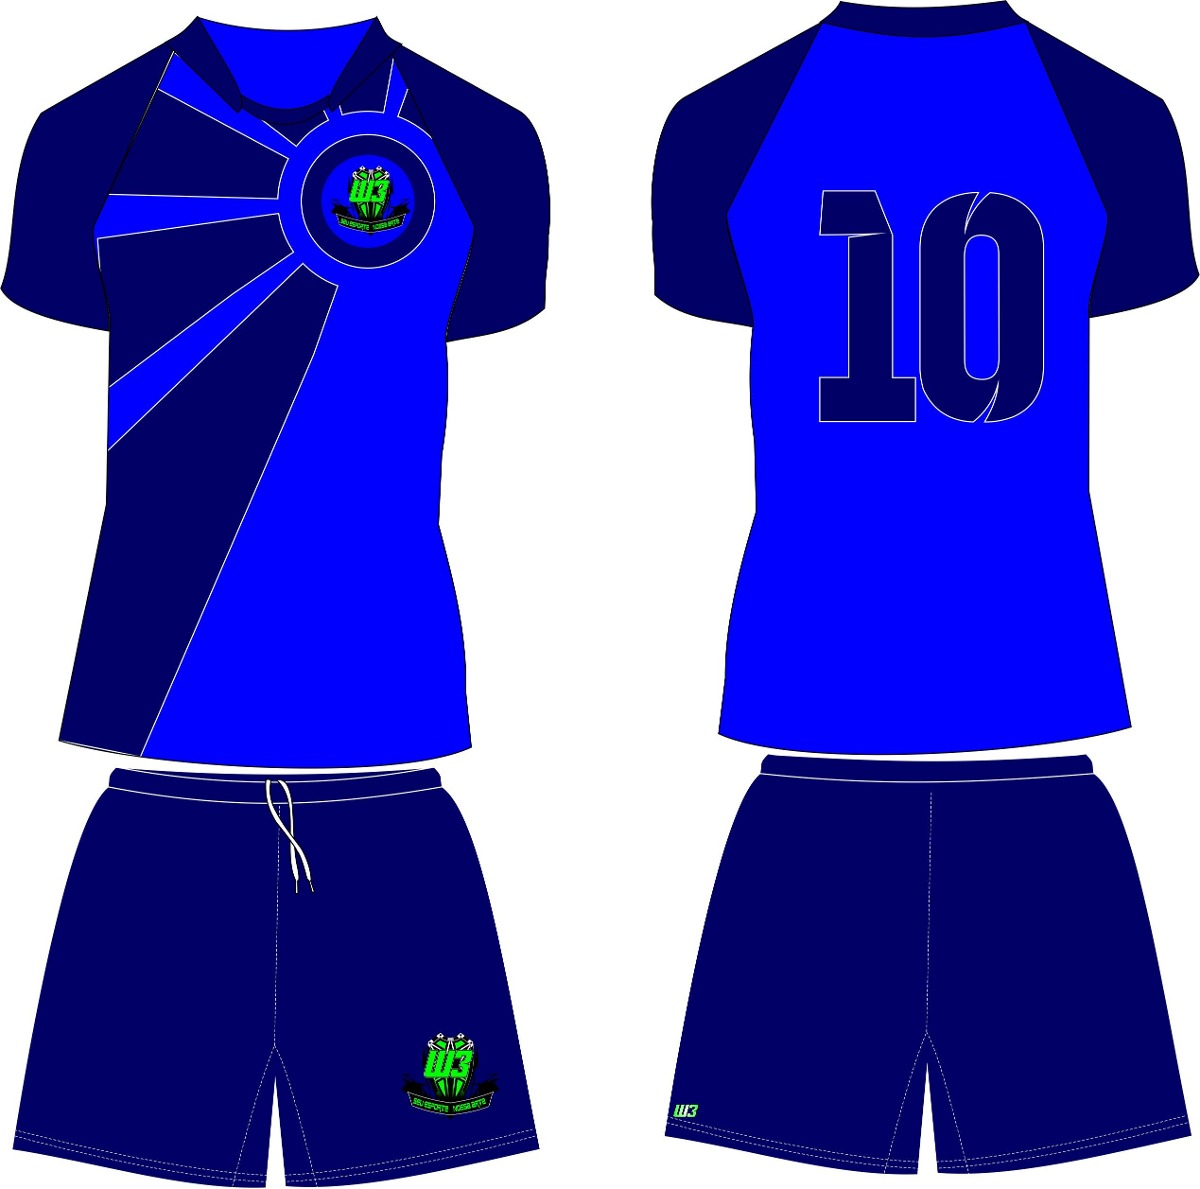 1ae6bb51b3 uniforme esportivo personalizado futebol chacara futsa 16cnj. Carregando  zoom.